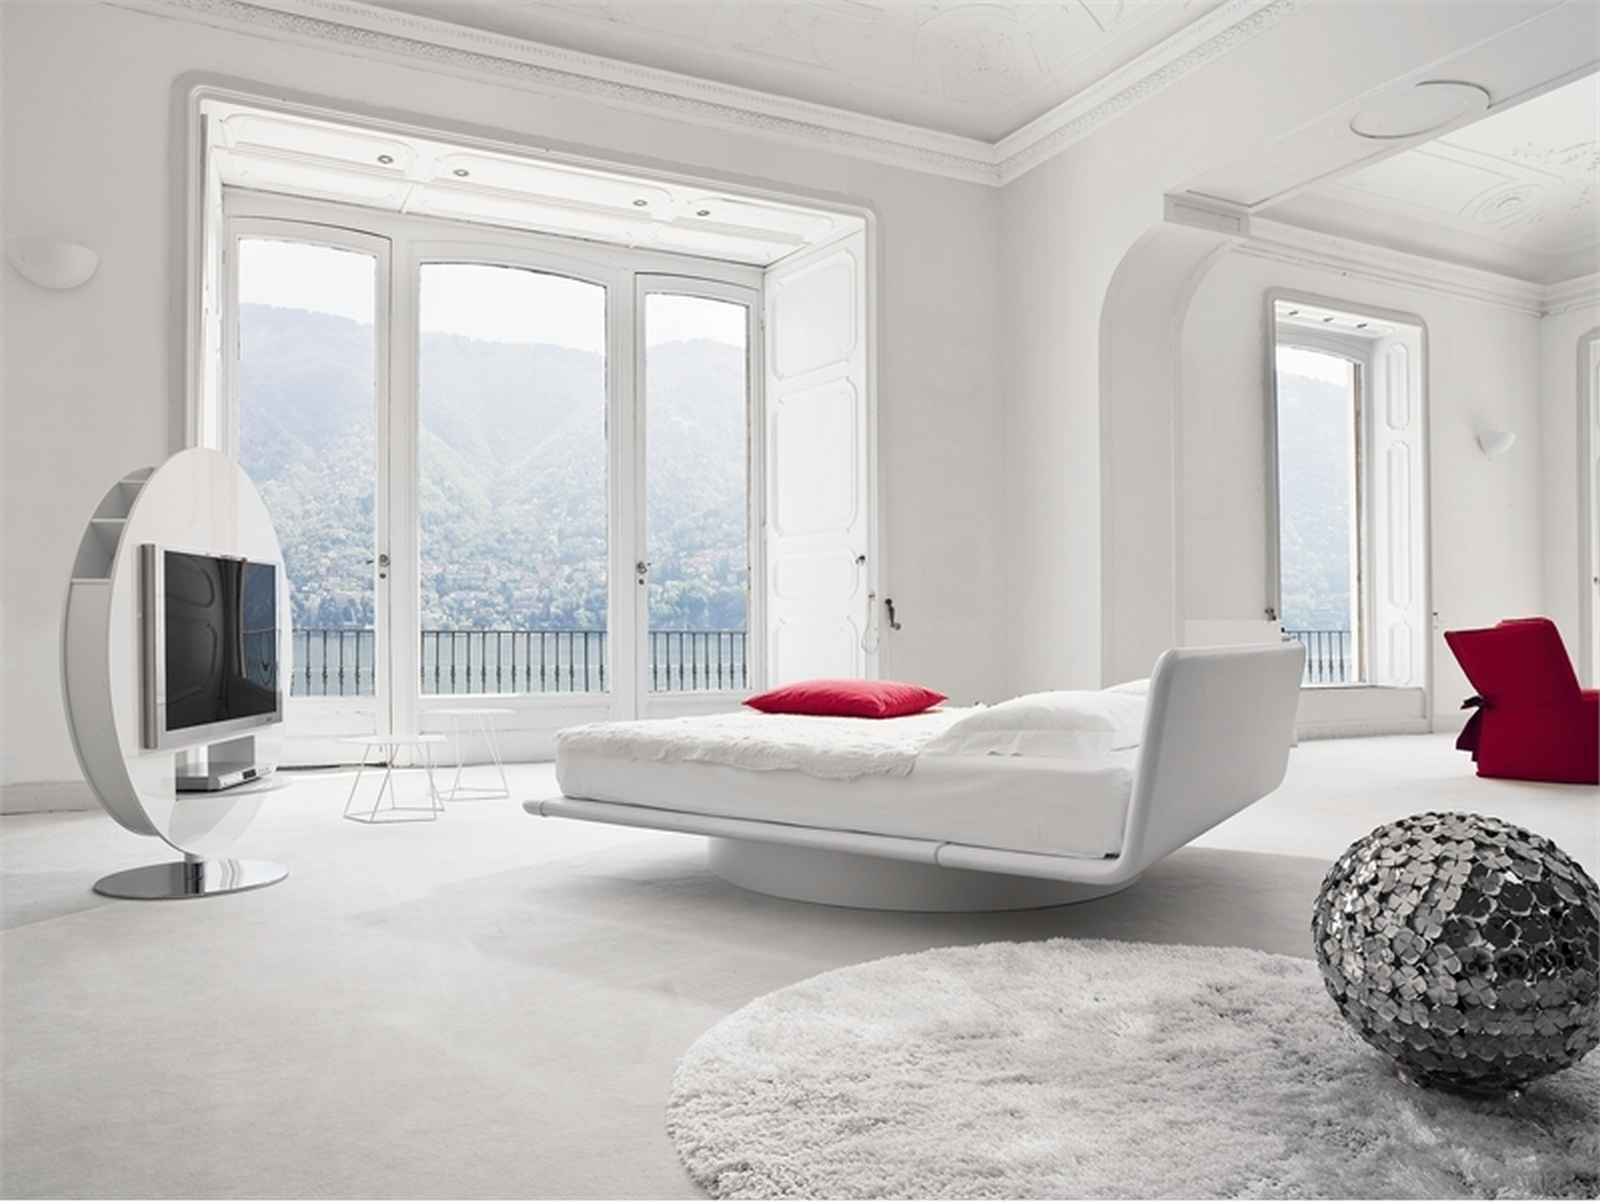 Ideale Slaapkamer Kleuren : De ideale lichte slaapkamer u boxspring kopen